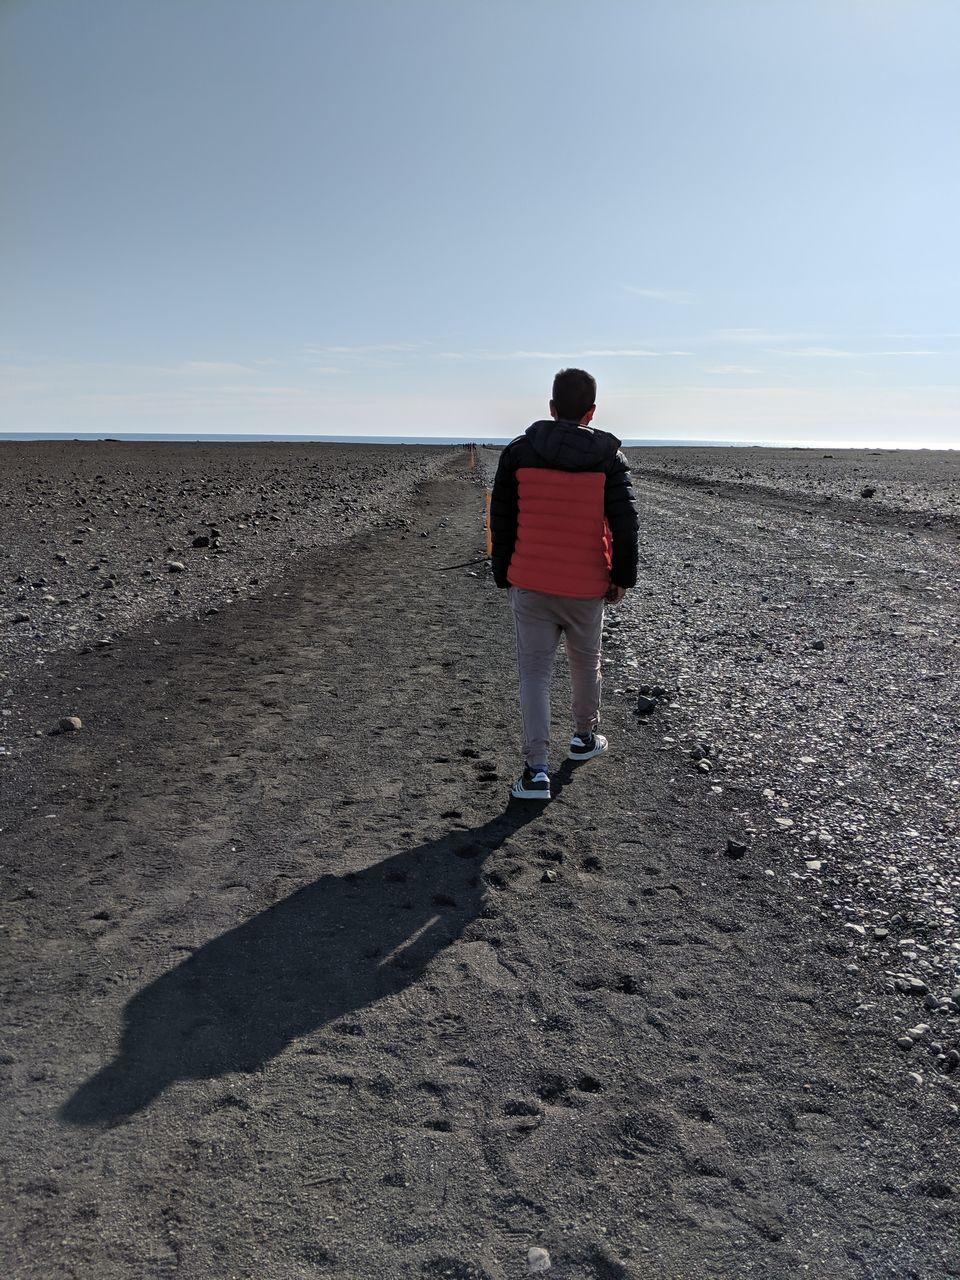 Photo of Path to Wrecked DC-3 Plane on Sólheimasandur, Iceland by Sudipta Nandy